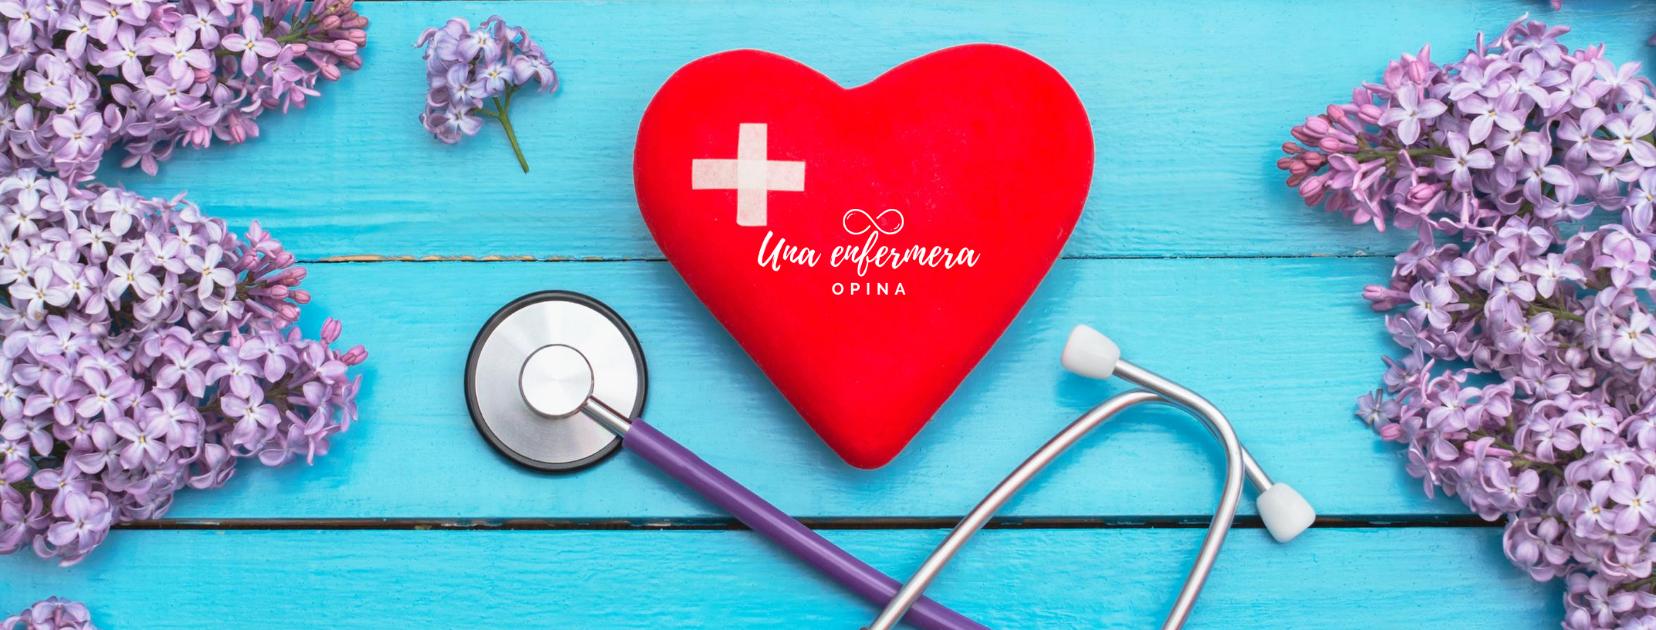 Una Enfermera Opina